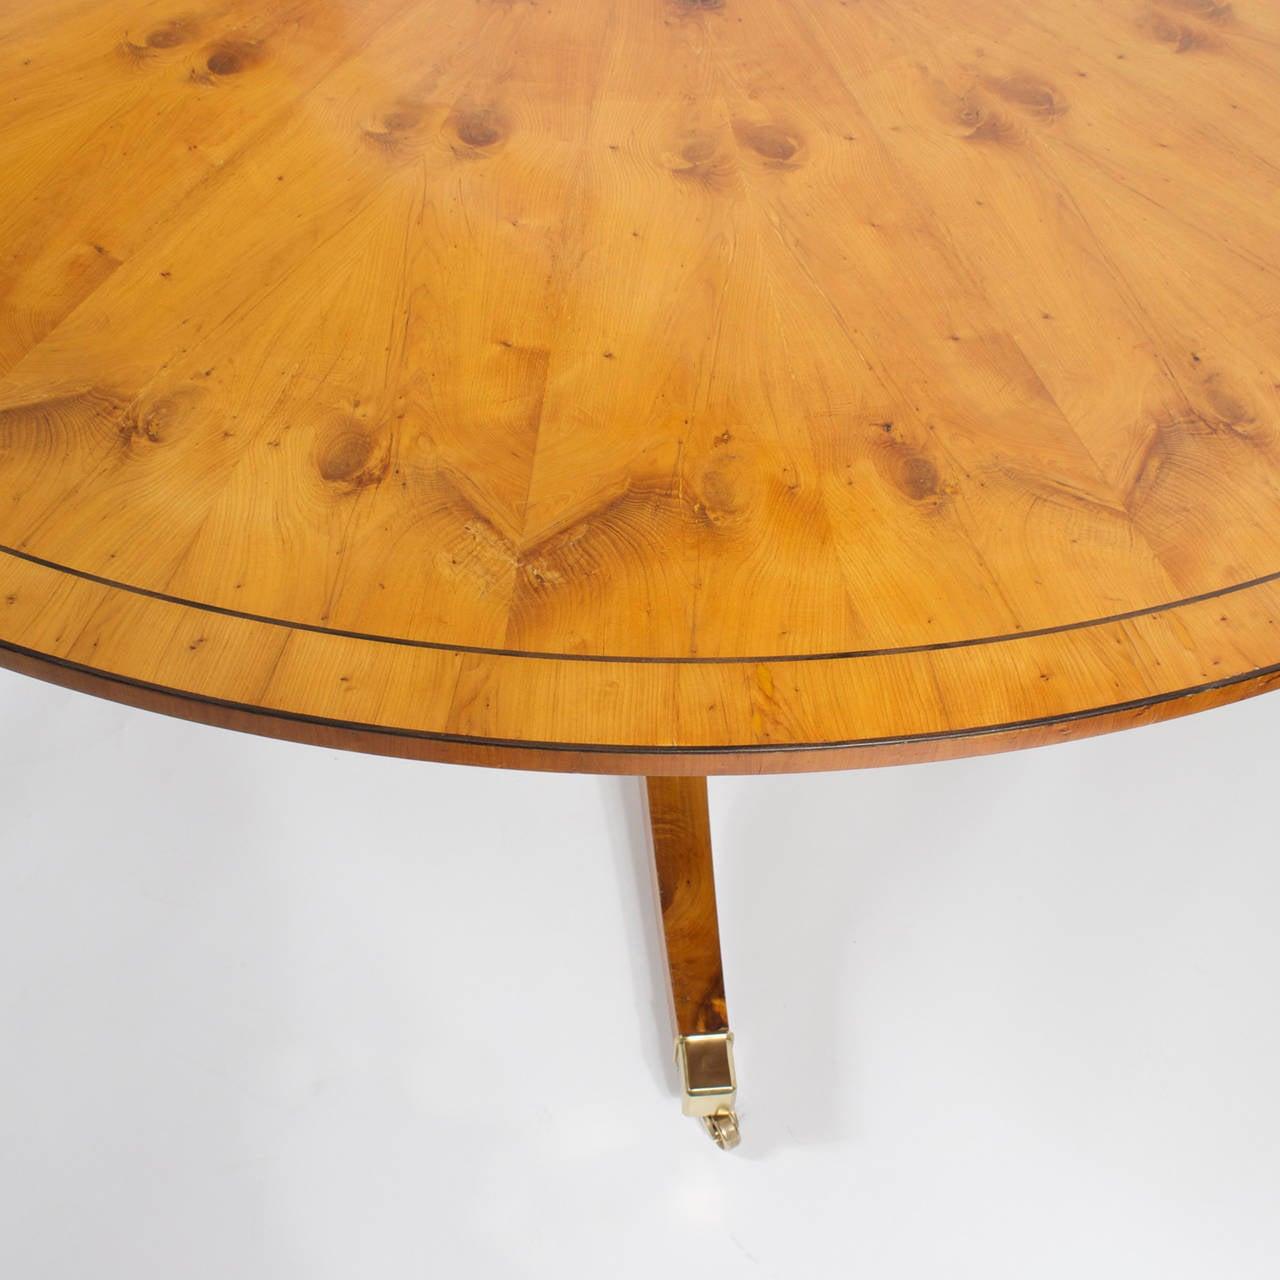 20th Century Round Yew Wood Regency Style Dining Table at  : RoundRegencyYewWoodDiningTable278546l from 1stdibs.com size 1280 x 1280 jpeg 112kB